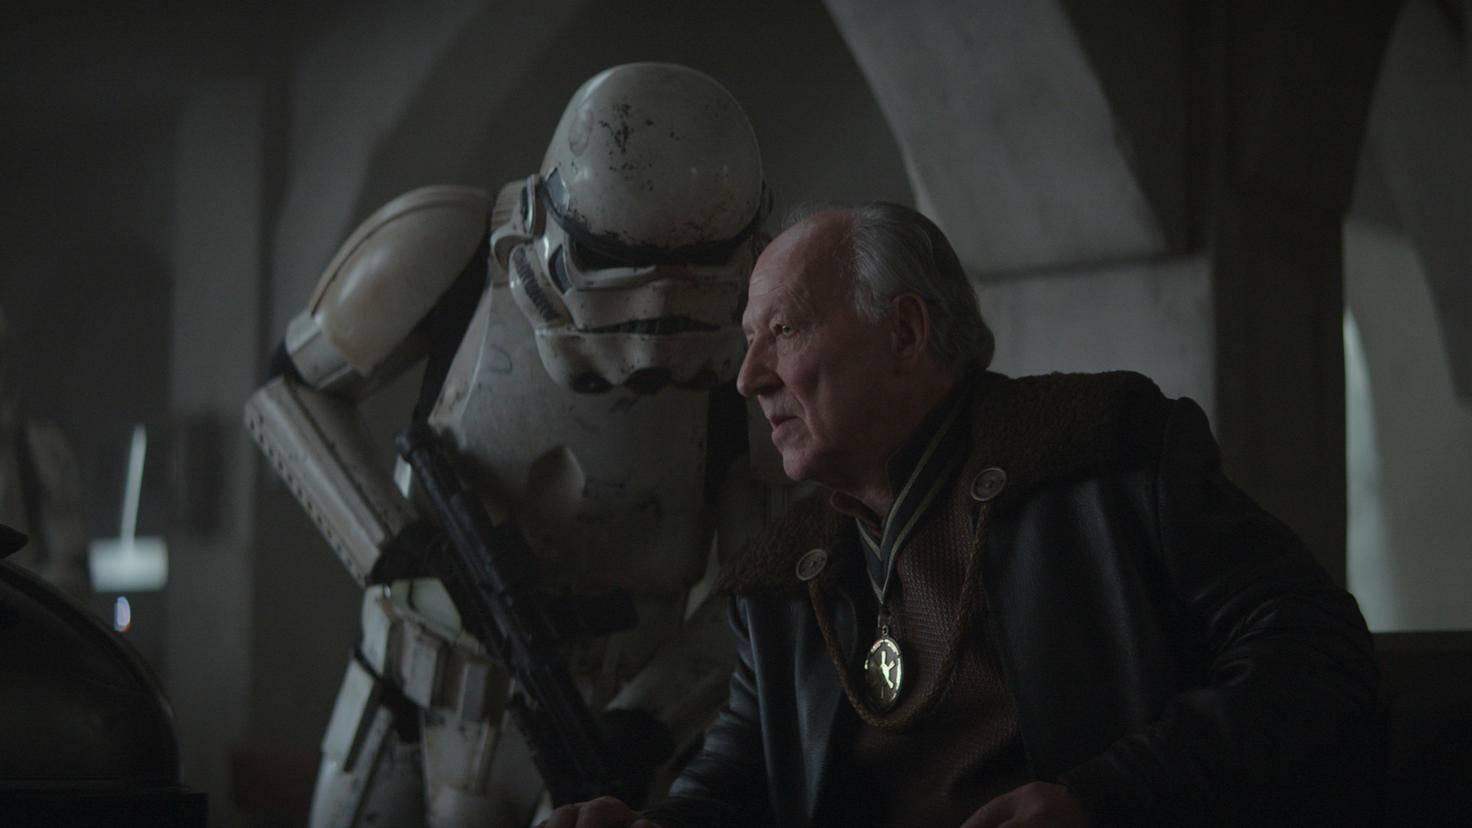 The Mandalorian Werner Herzog Klient S01E07